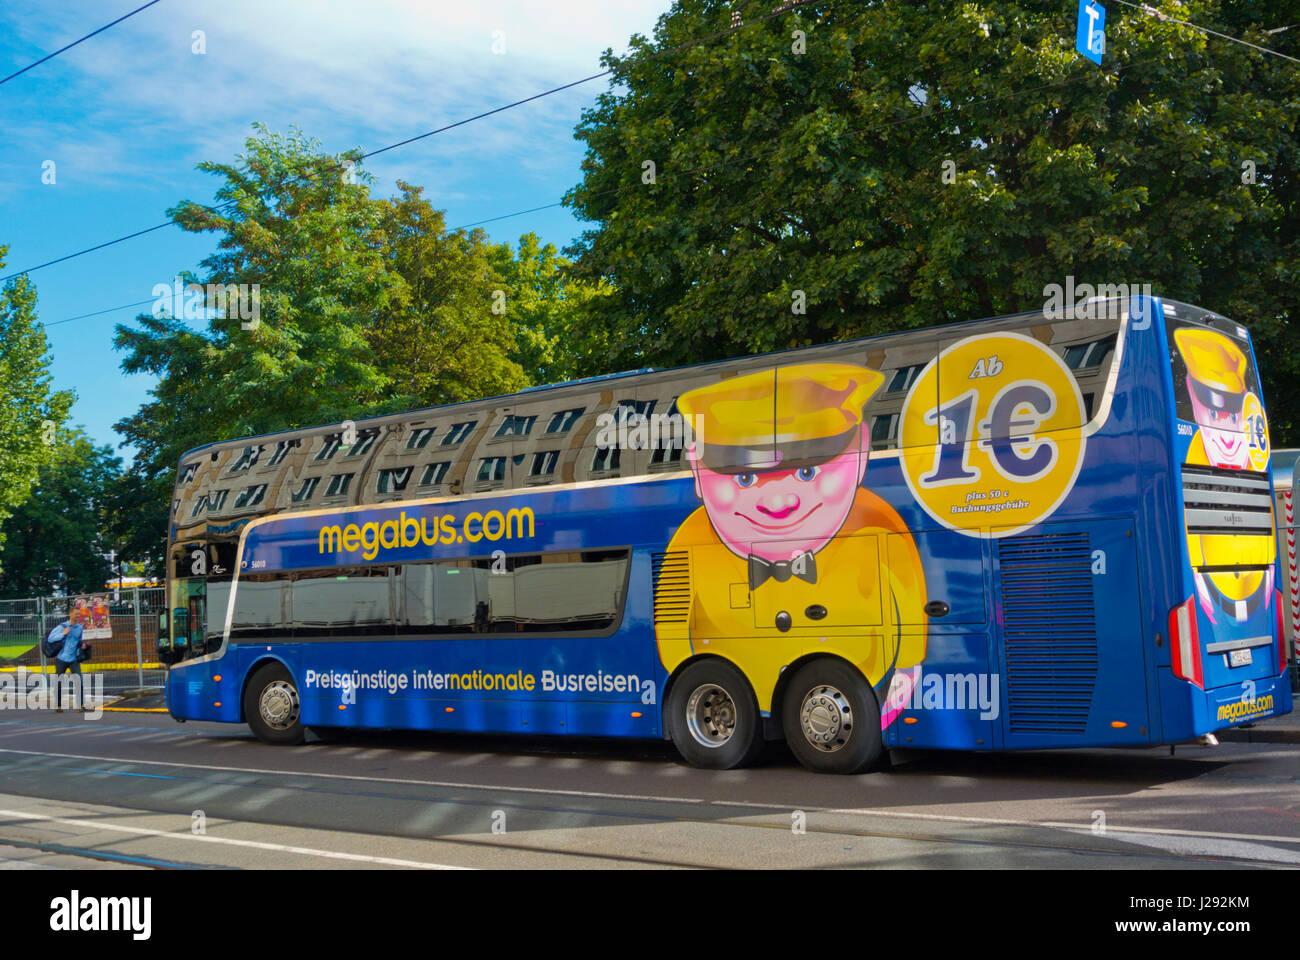 megabus at goethestrasse bus stops leipzig saxony germany stock photo royalty free image. Black Bedroom Furniture Sets. Home Design Ideas